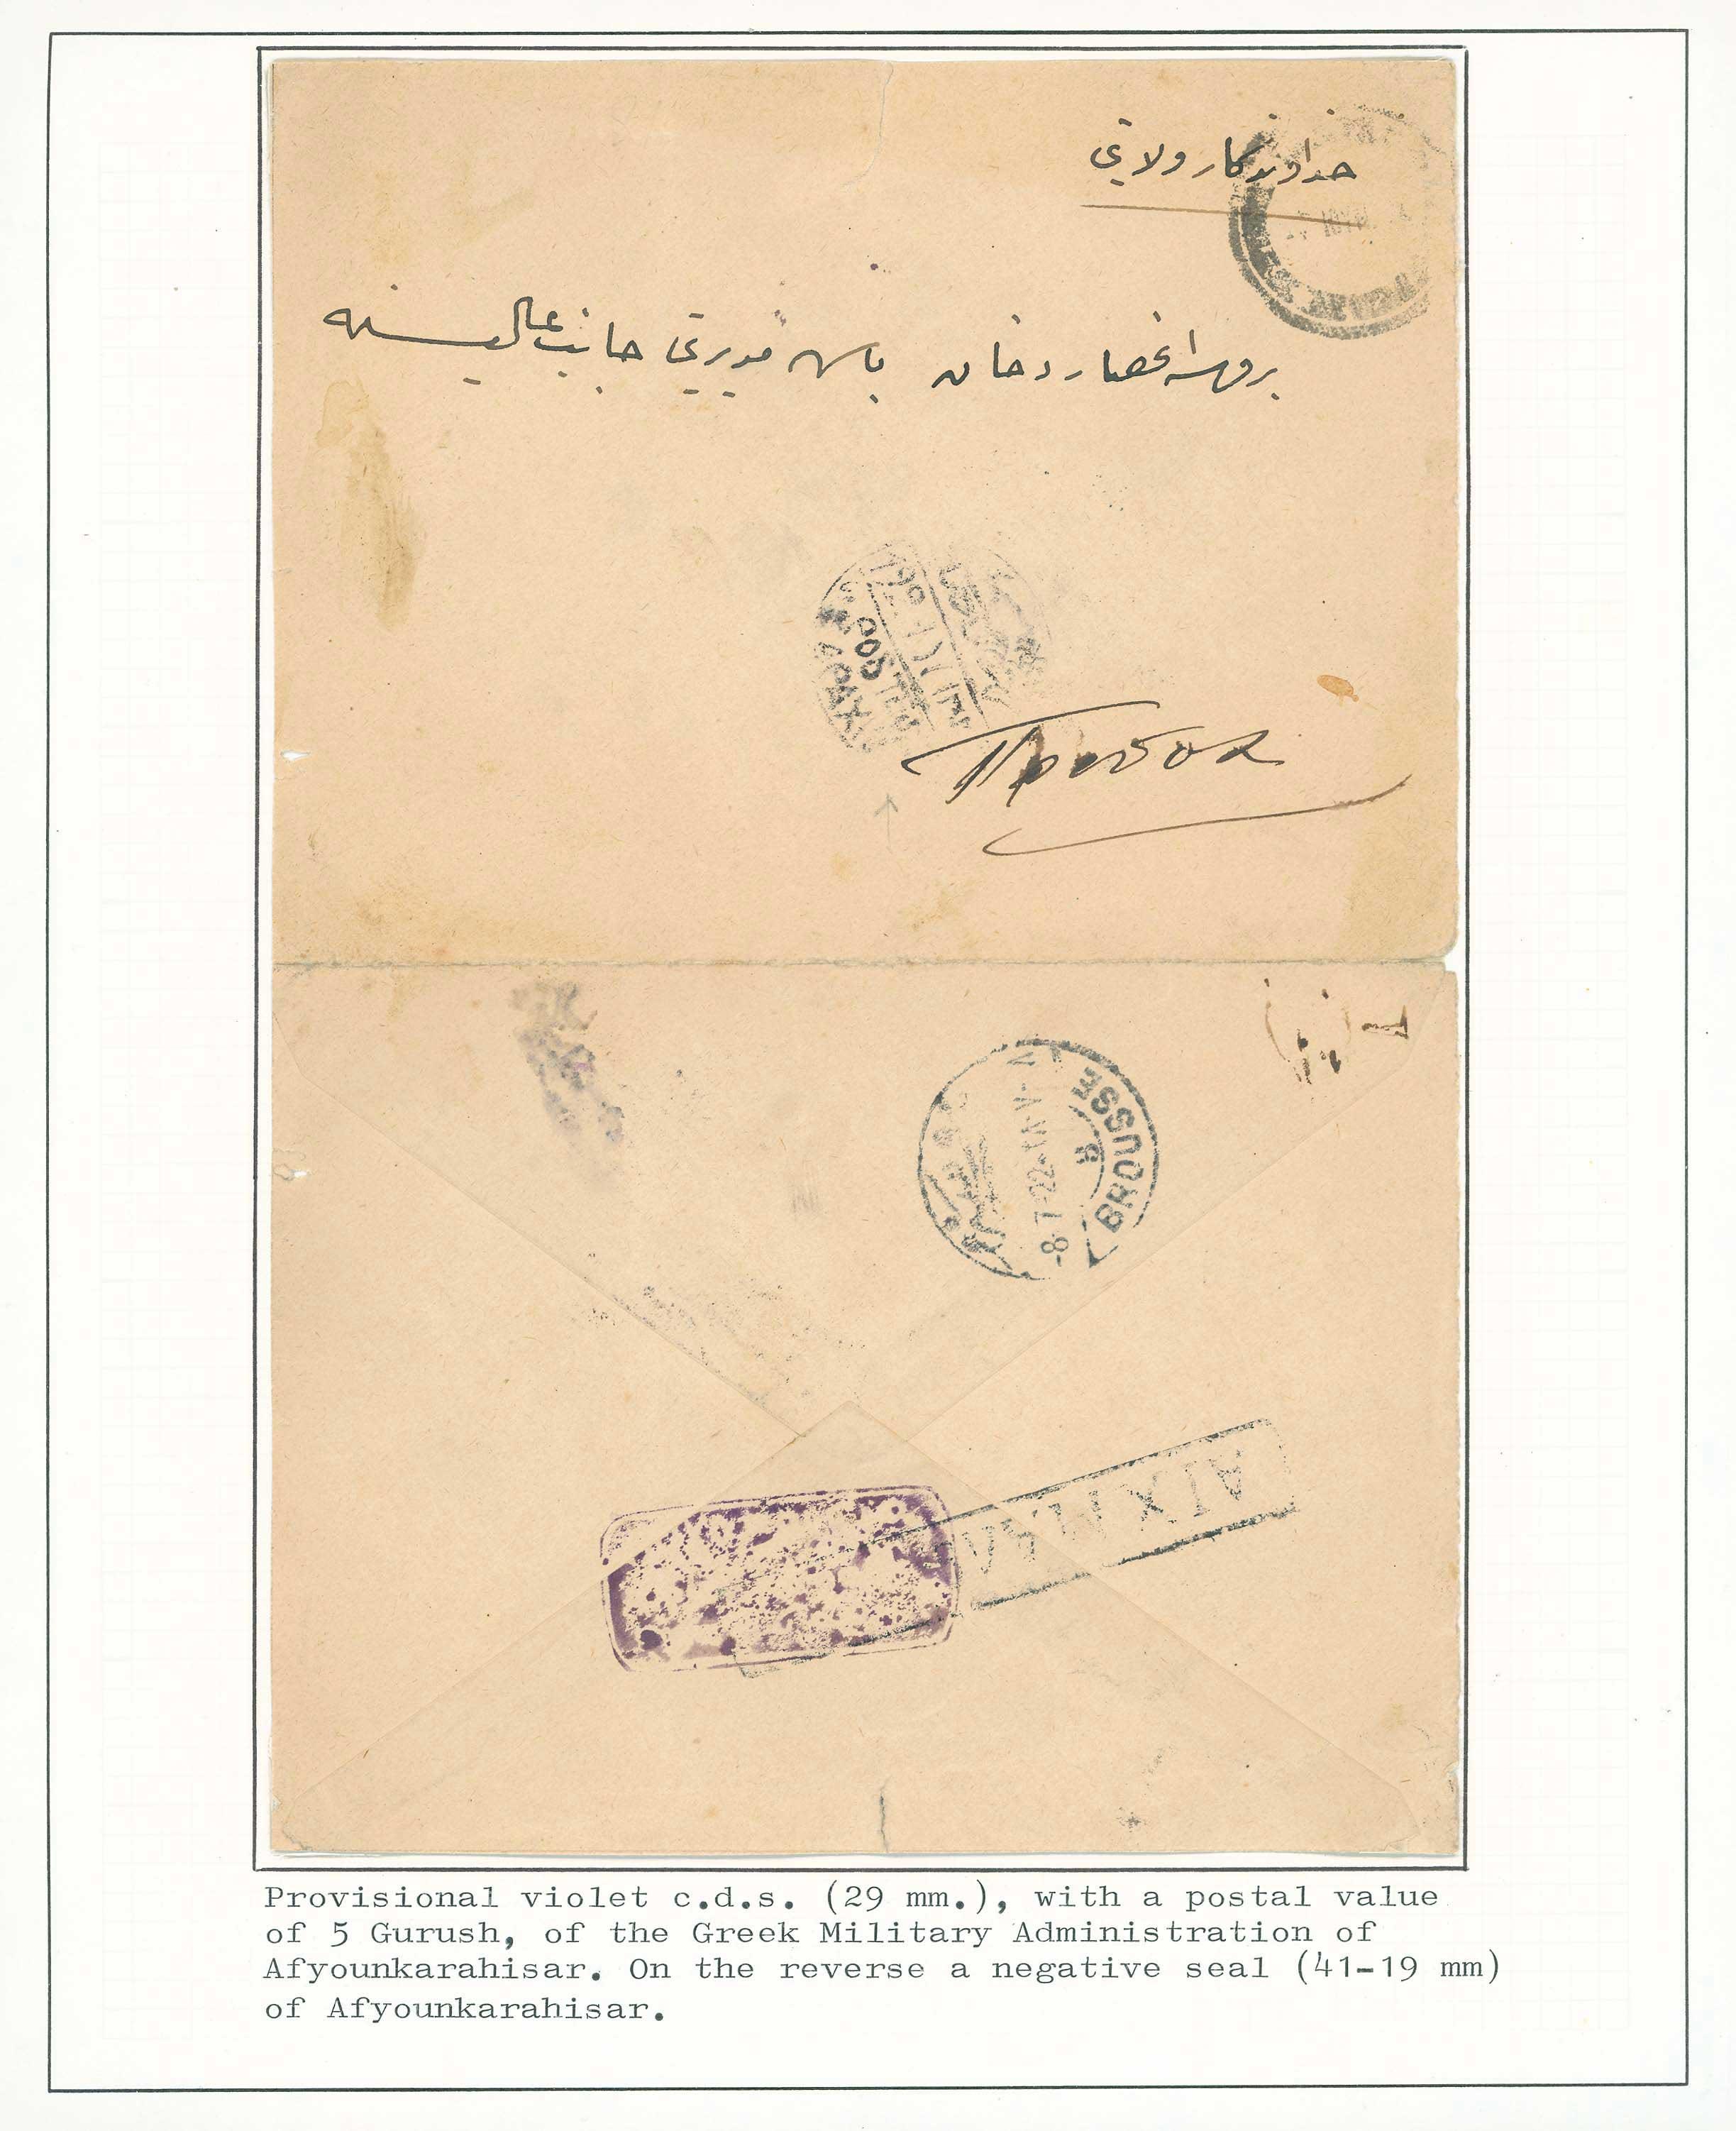 Lot 795 - -  SMYRNE,CONS/PLE & ASIA MINOR (before 1922) SMYRNE,CONS/PLE & ASIA MINOR (before 1922) -  A. Karamitsos Postal & Live Internet Auction 681 General Philatelic Auction